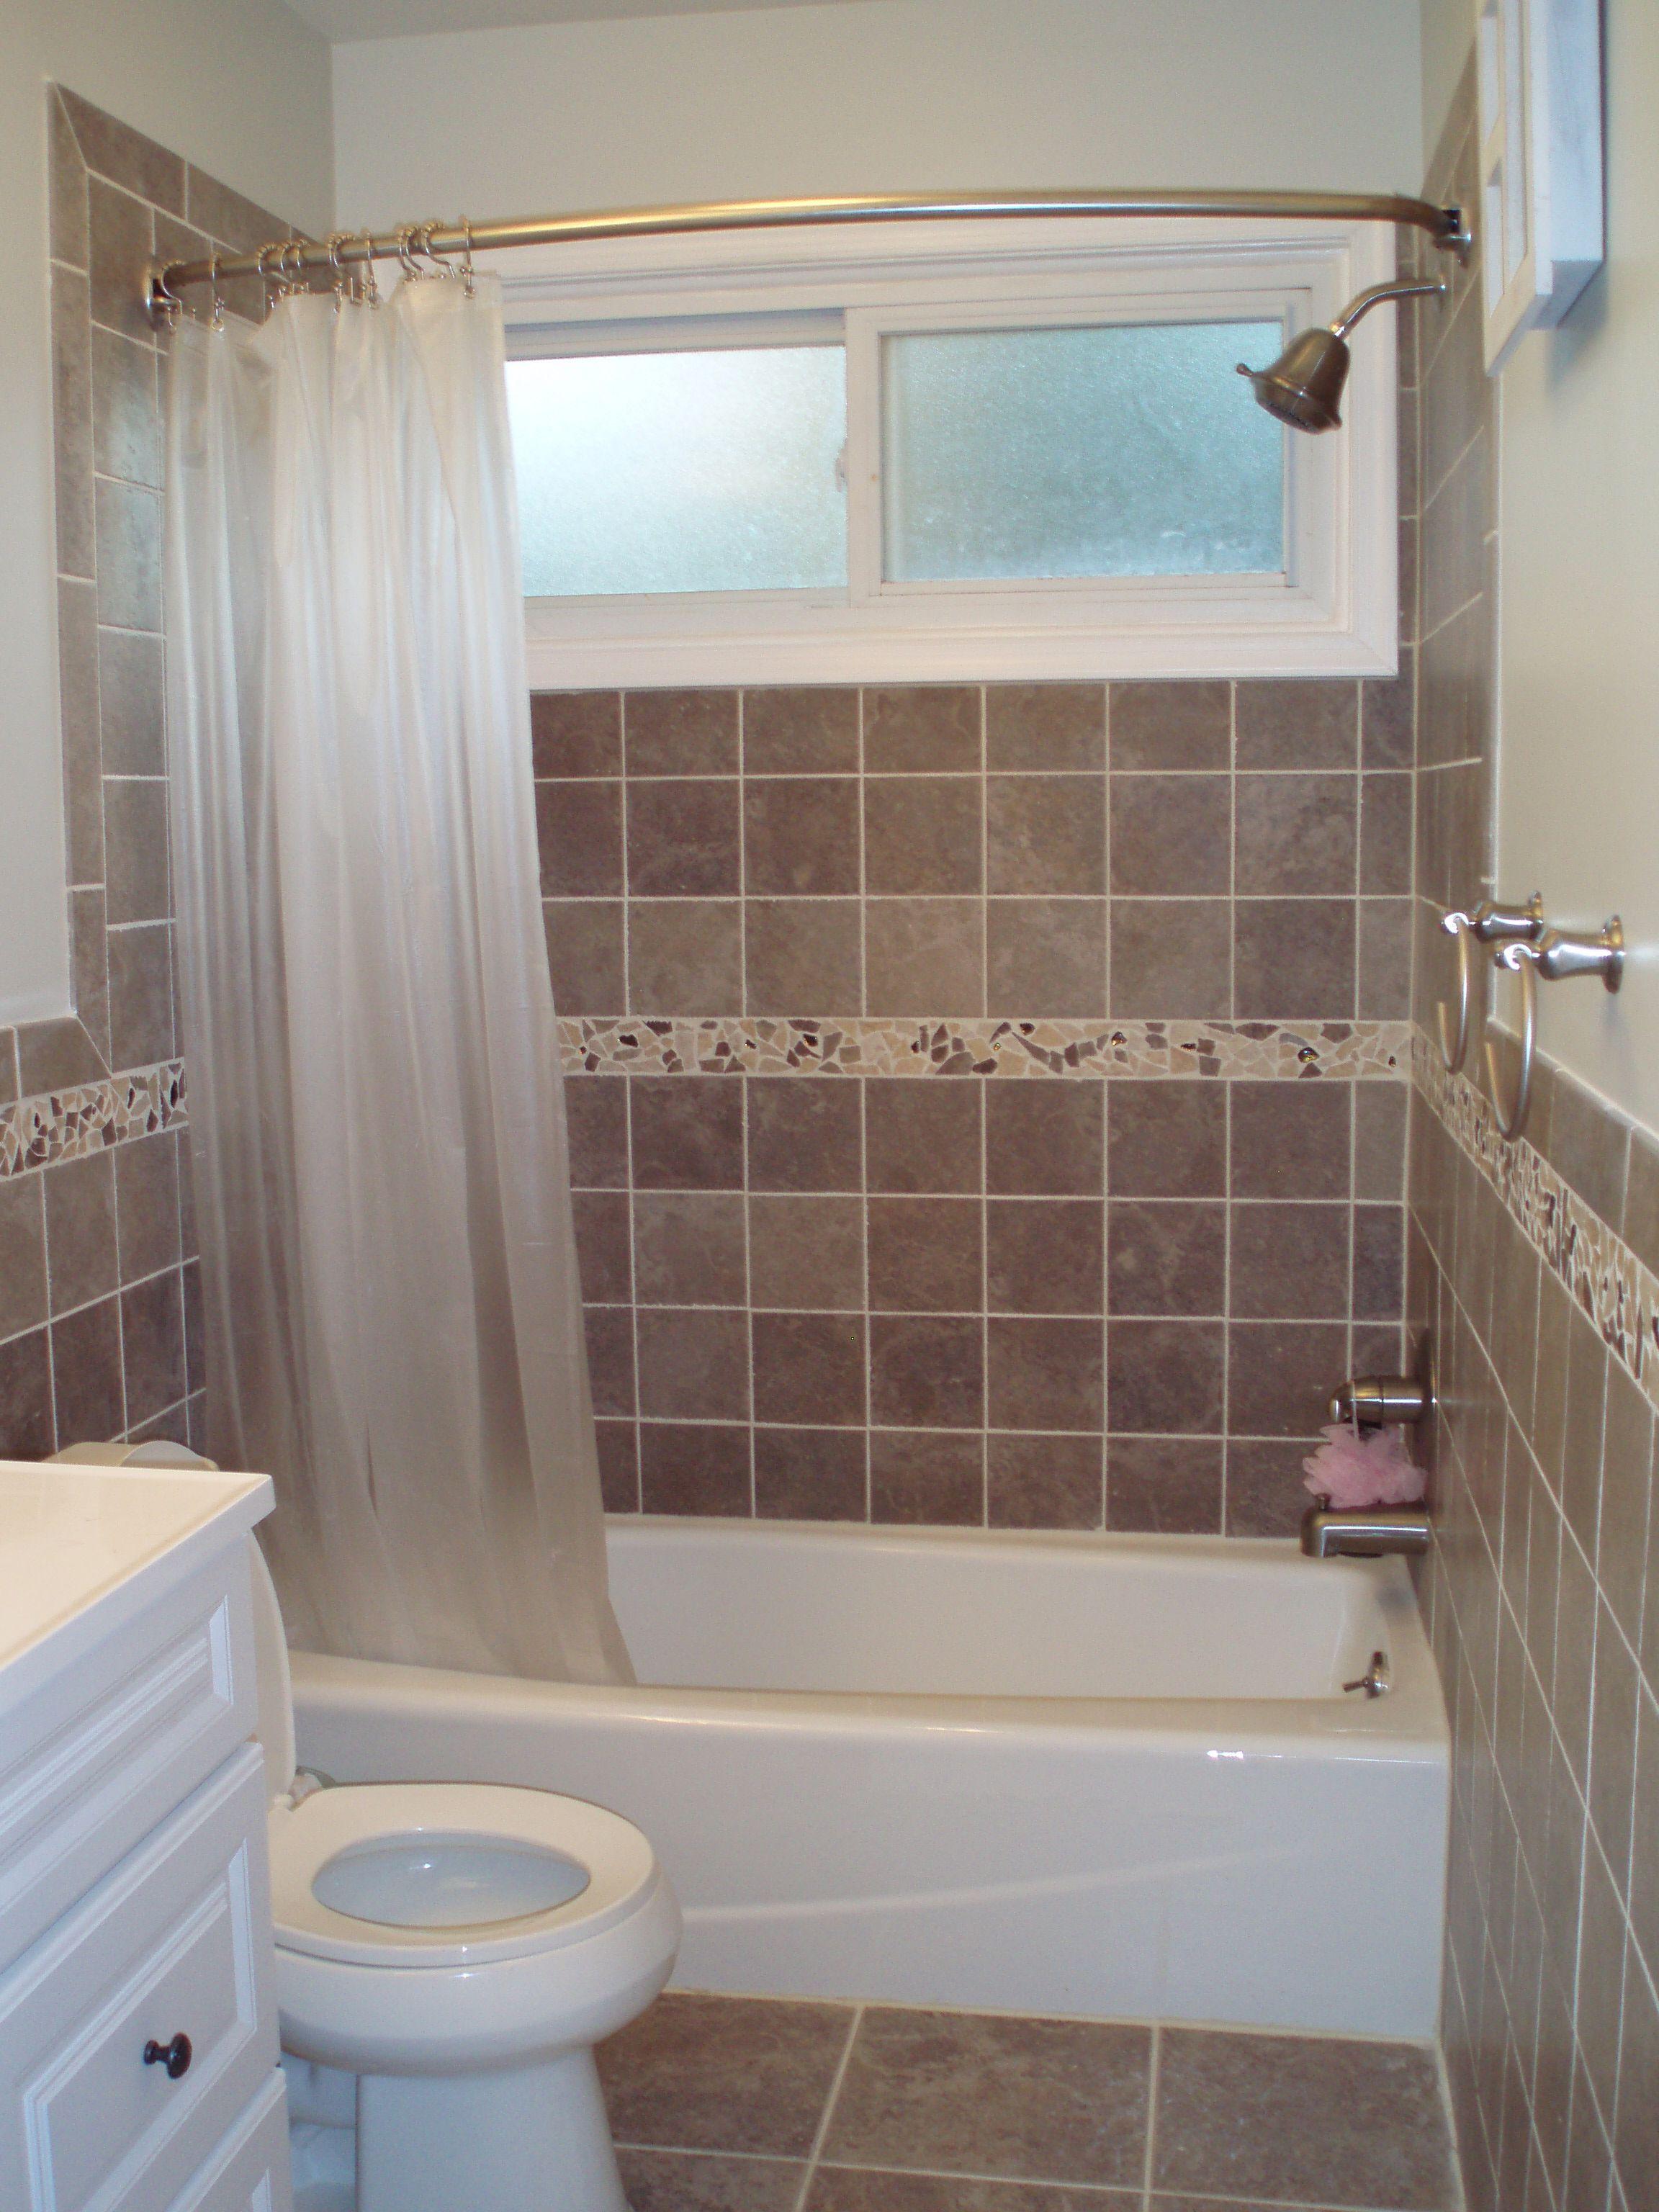 Bathroom Small Bathroom Decorating Ideas On Tight Budget - Small bathroom decorating ideas on tight budget creative ideas